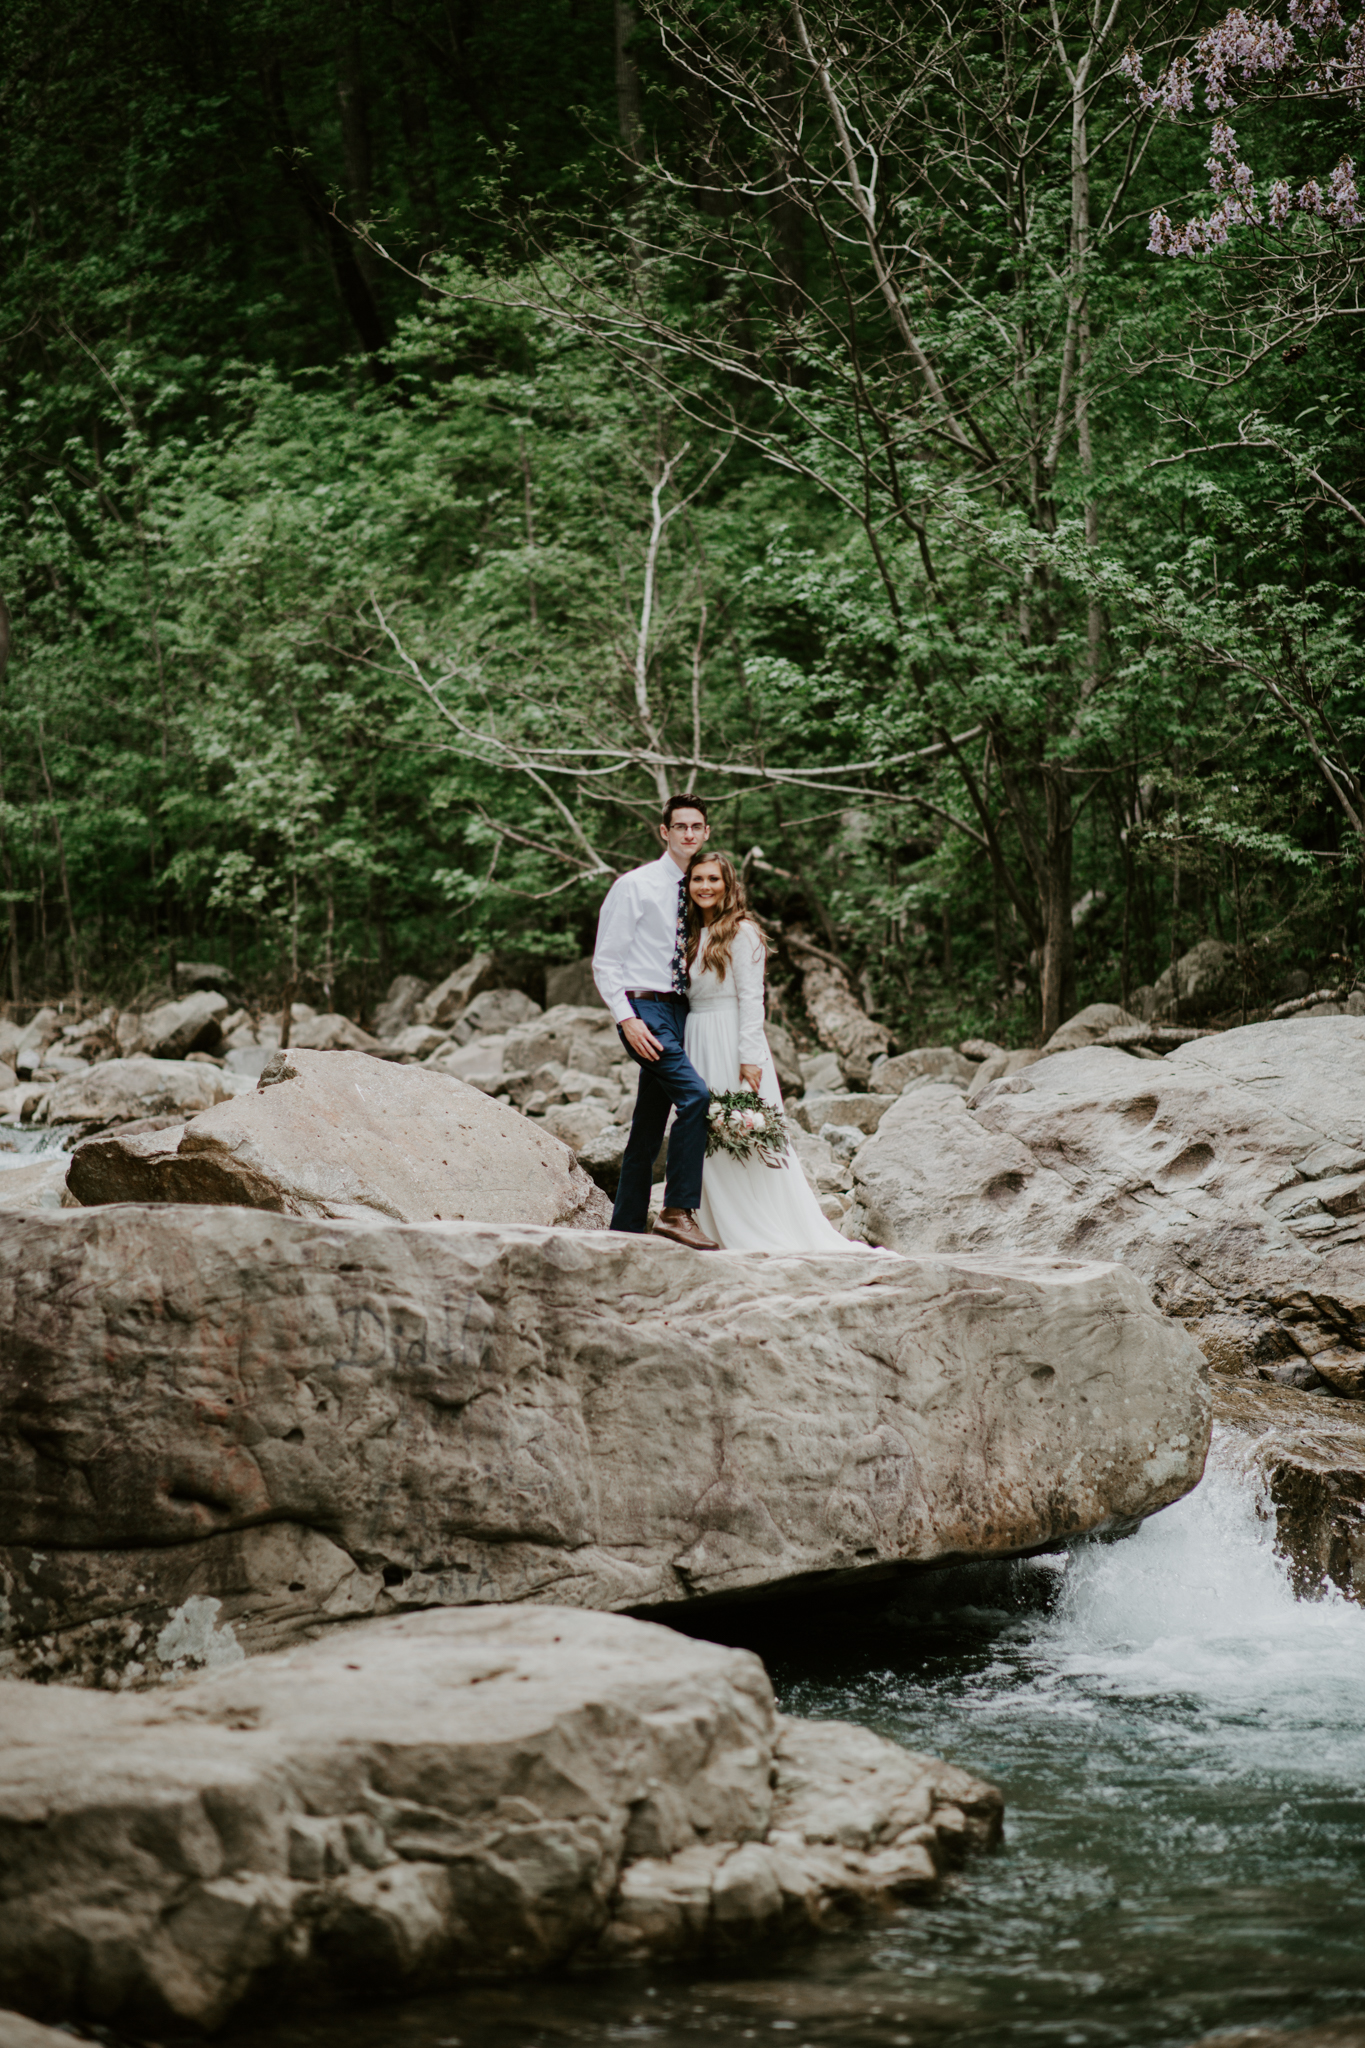 Lacey-Joe-Chattanooga-Nashville-Tennessee-Wedding-Elopement-Photographer-204.jpg